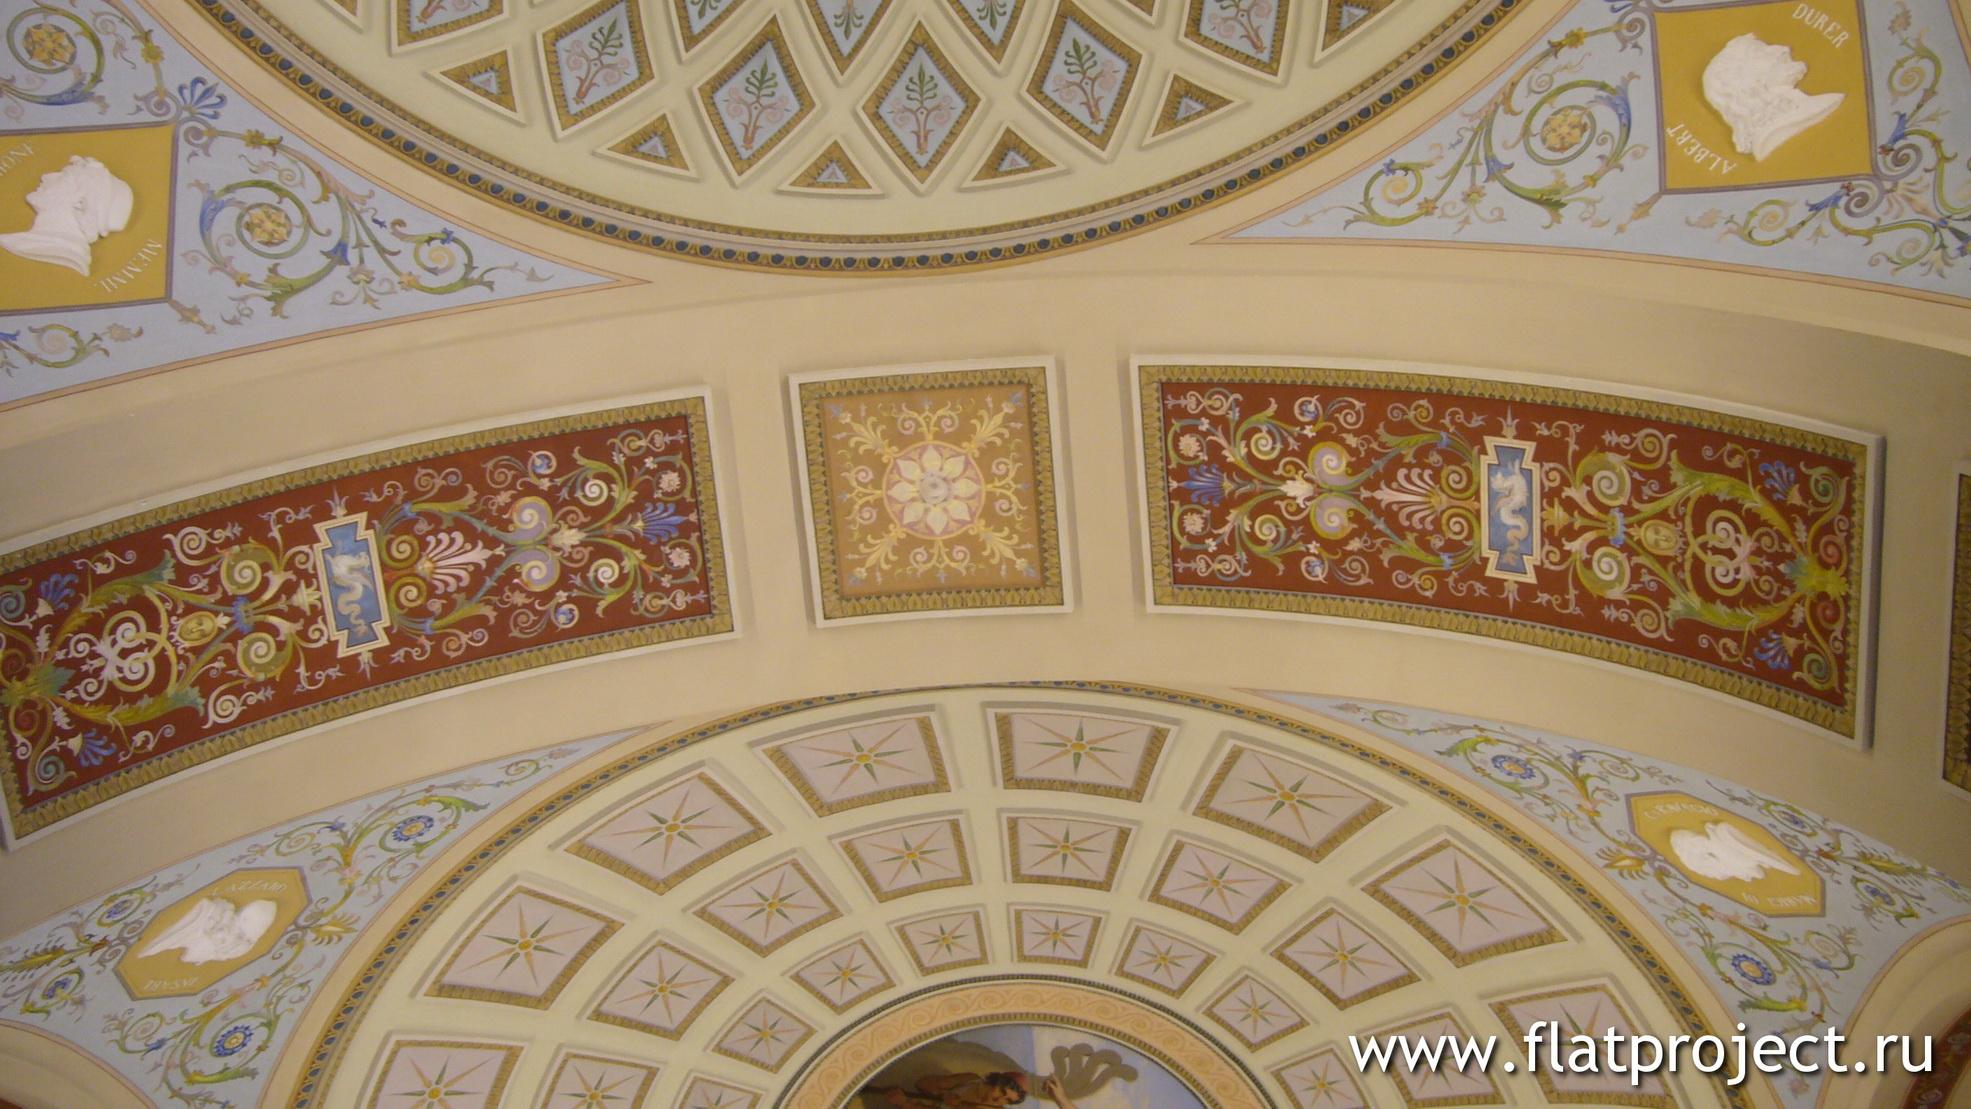 The State Hermitage museum interiors – photo 245